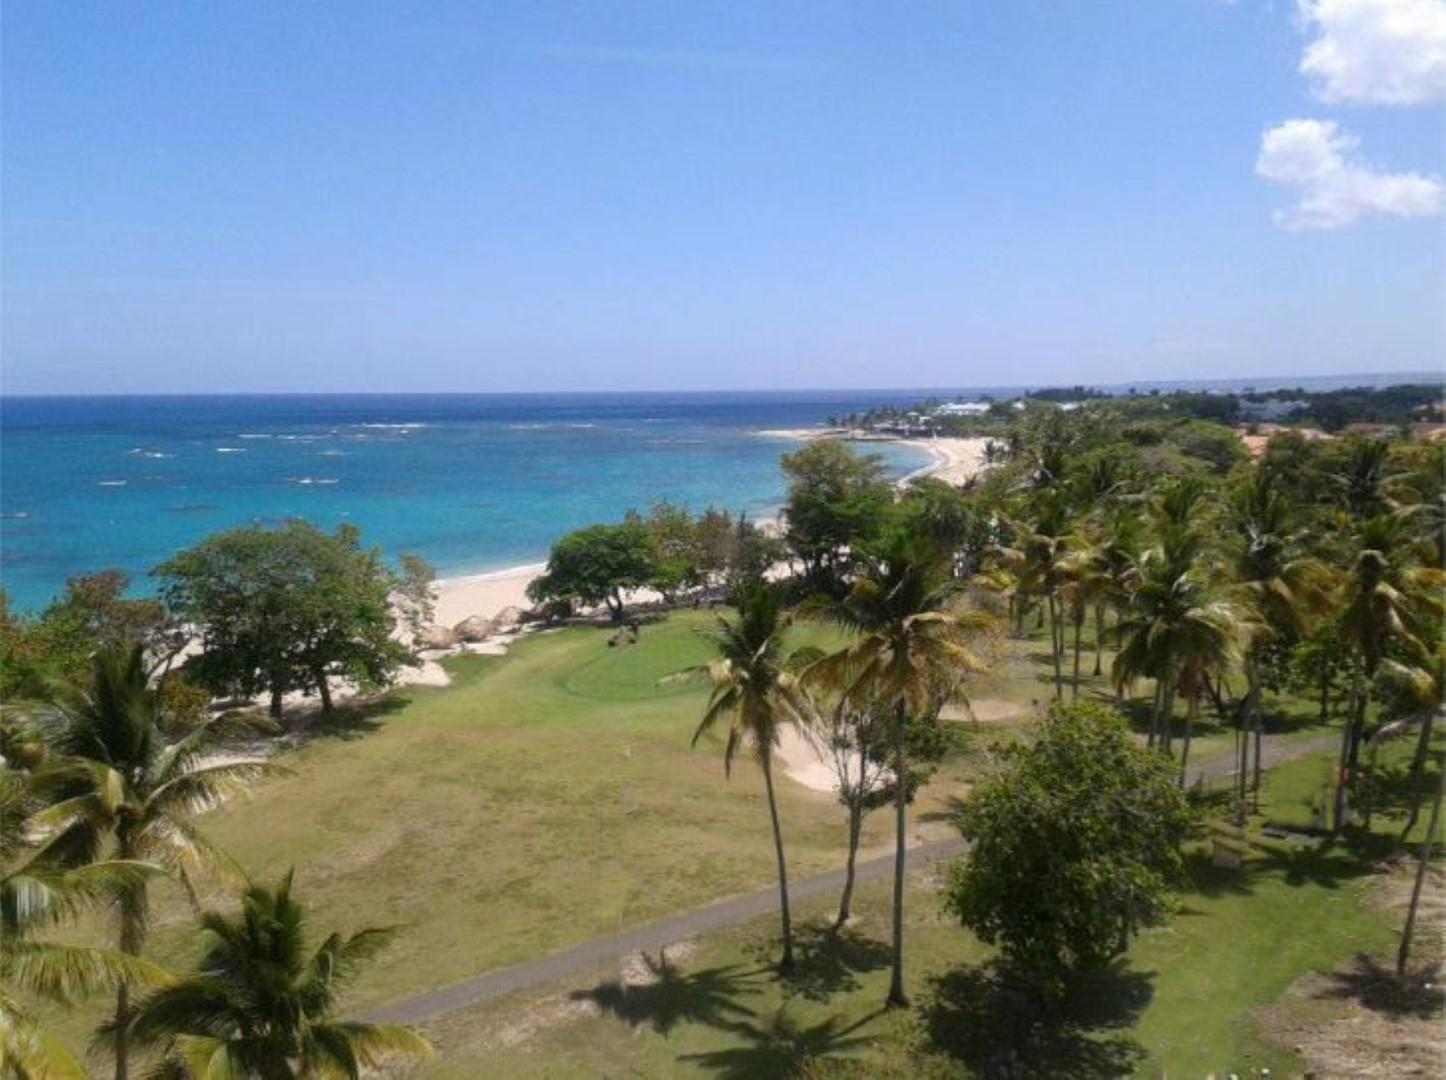 Playa Dorada Luxury Condominium Blue Cove Realtyblue